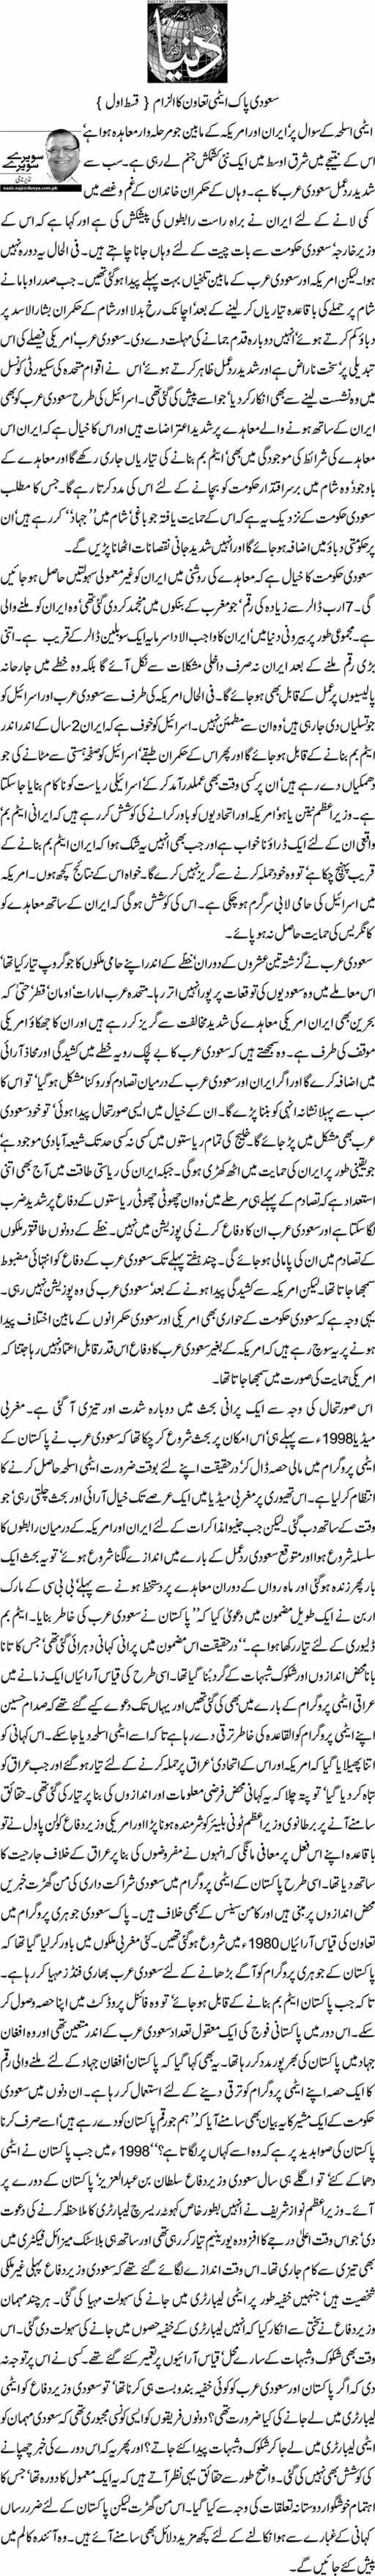 Saudi Pak Atomic Tawaun Ka Ilzam (Kist-1) - Nazeer Naji